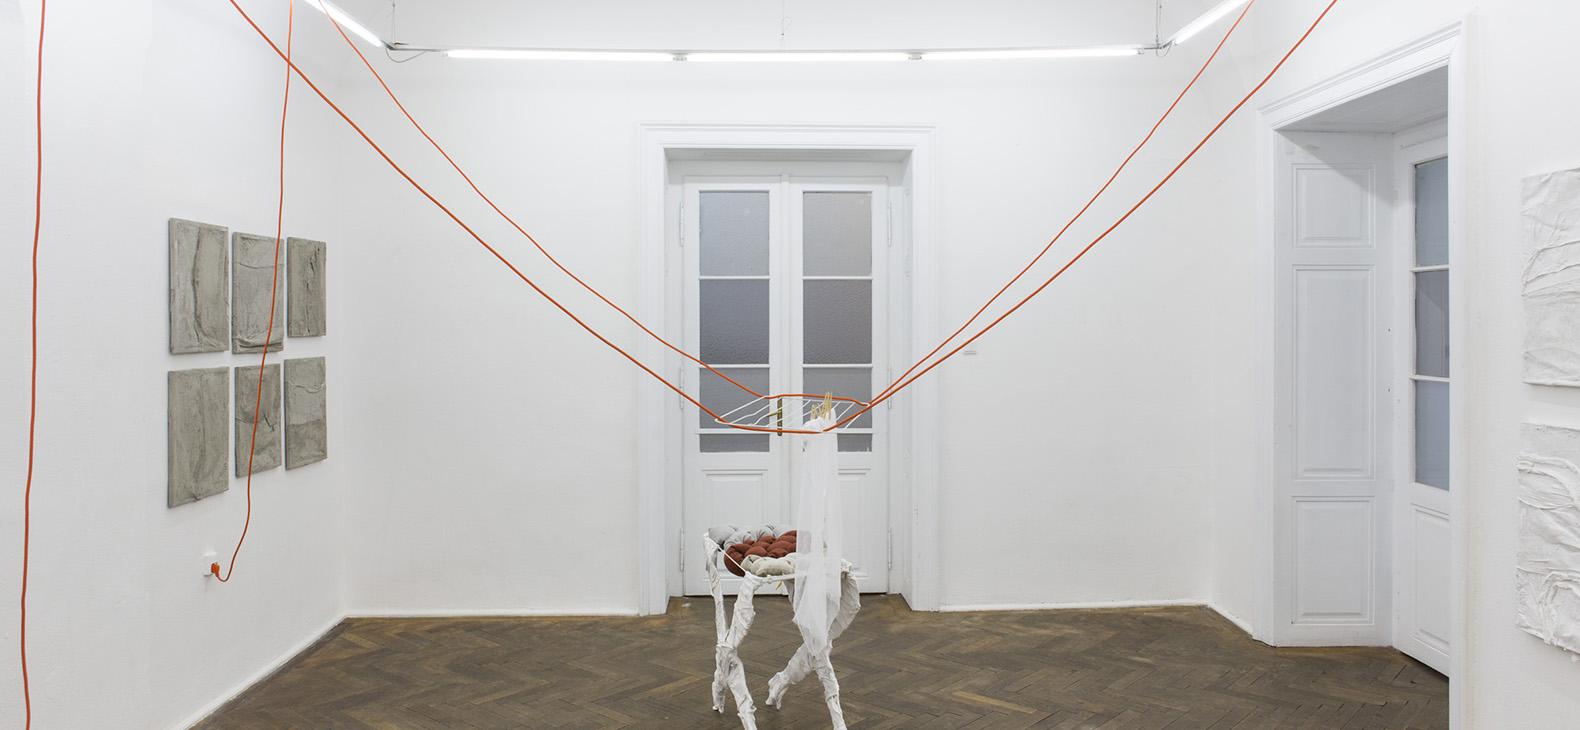 KAIR Kosice Exhibition - intallation by Barbora Fastrova